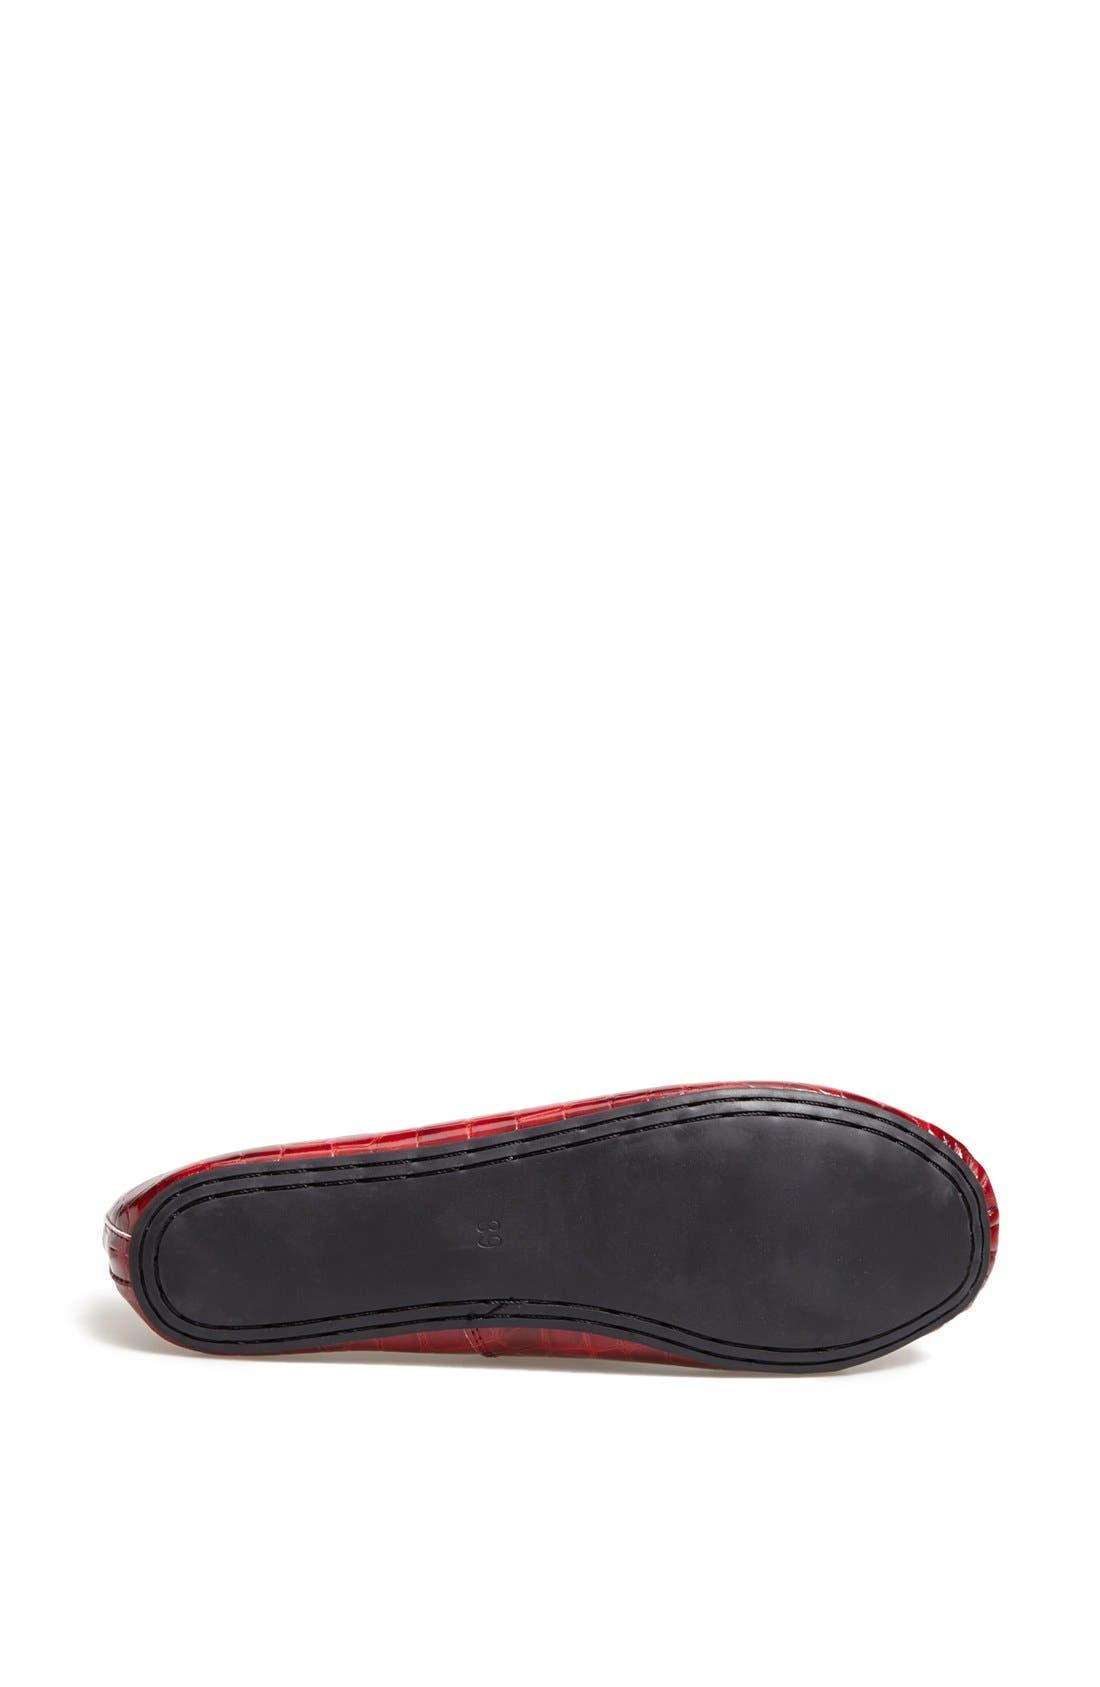 Alternate Image 4  - Topshop 'Vibrant' Croc Embossed Ballerina Flat